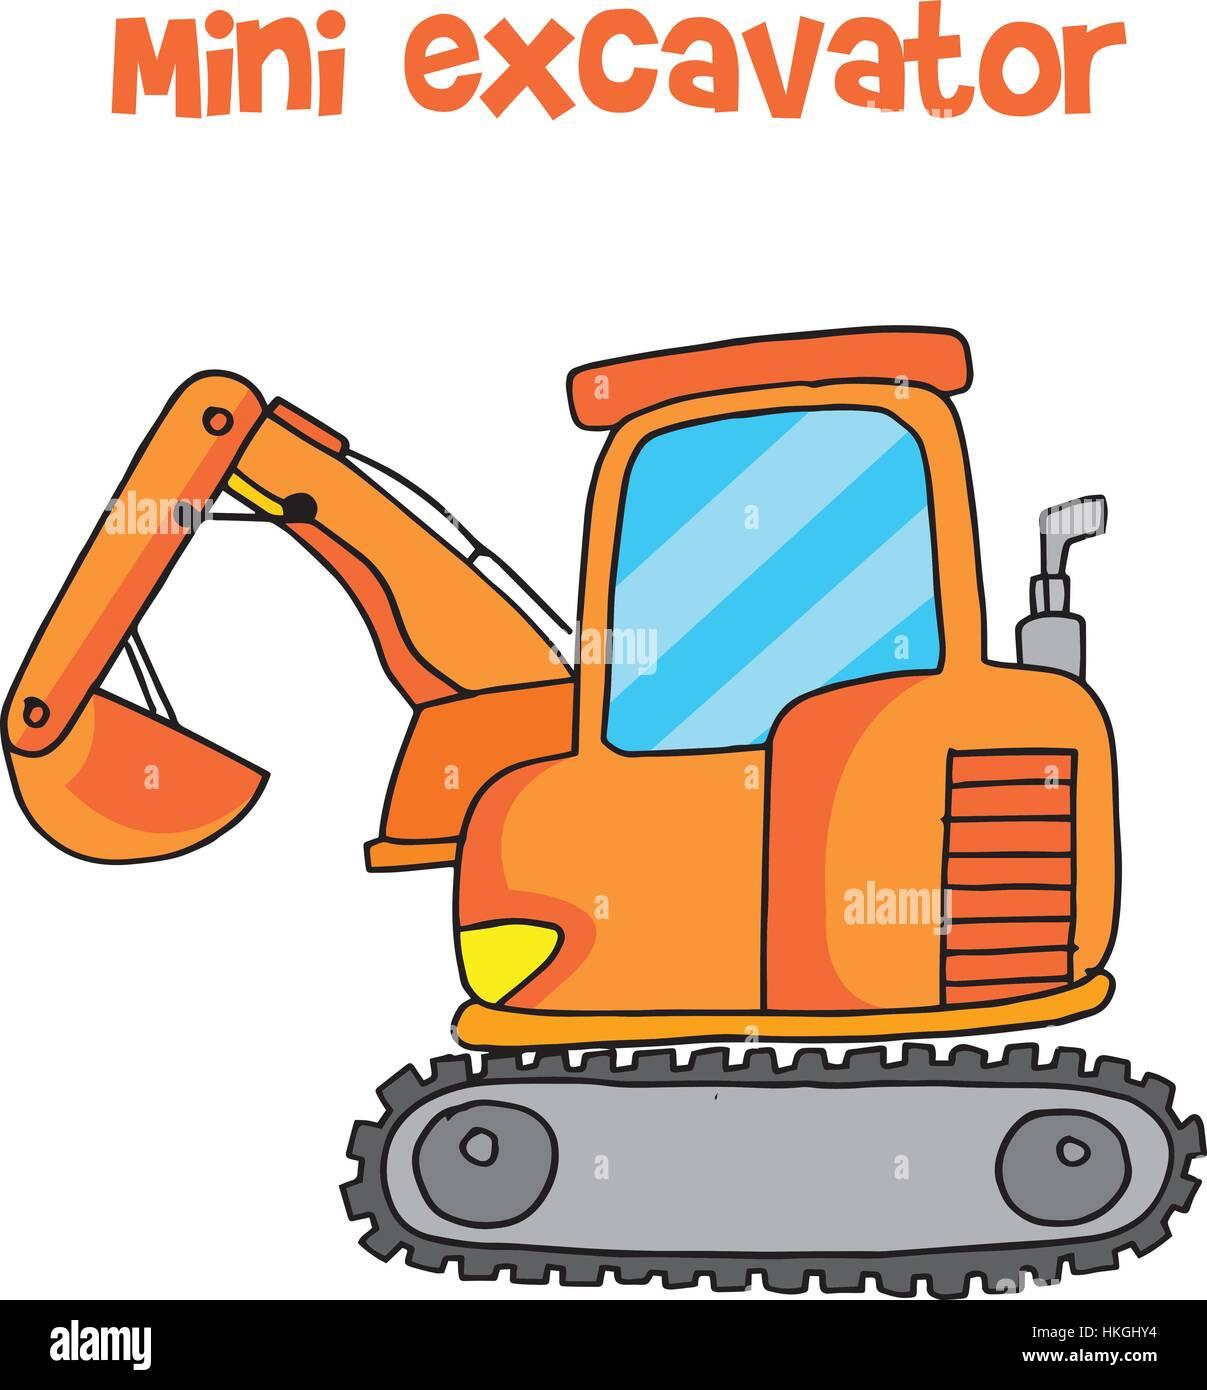 Hand Draw Mini Excavator Stock Photos & Hand Draw Mini